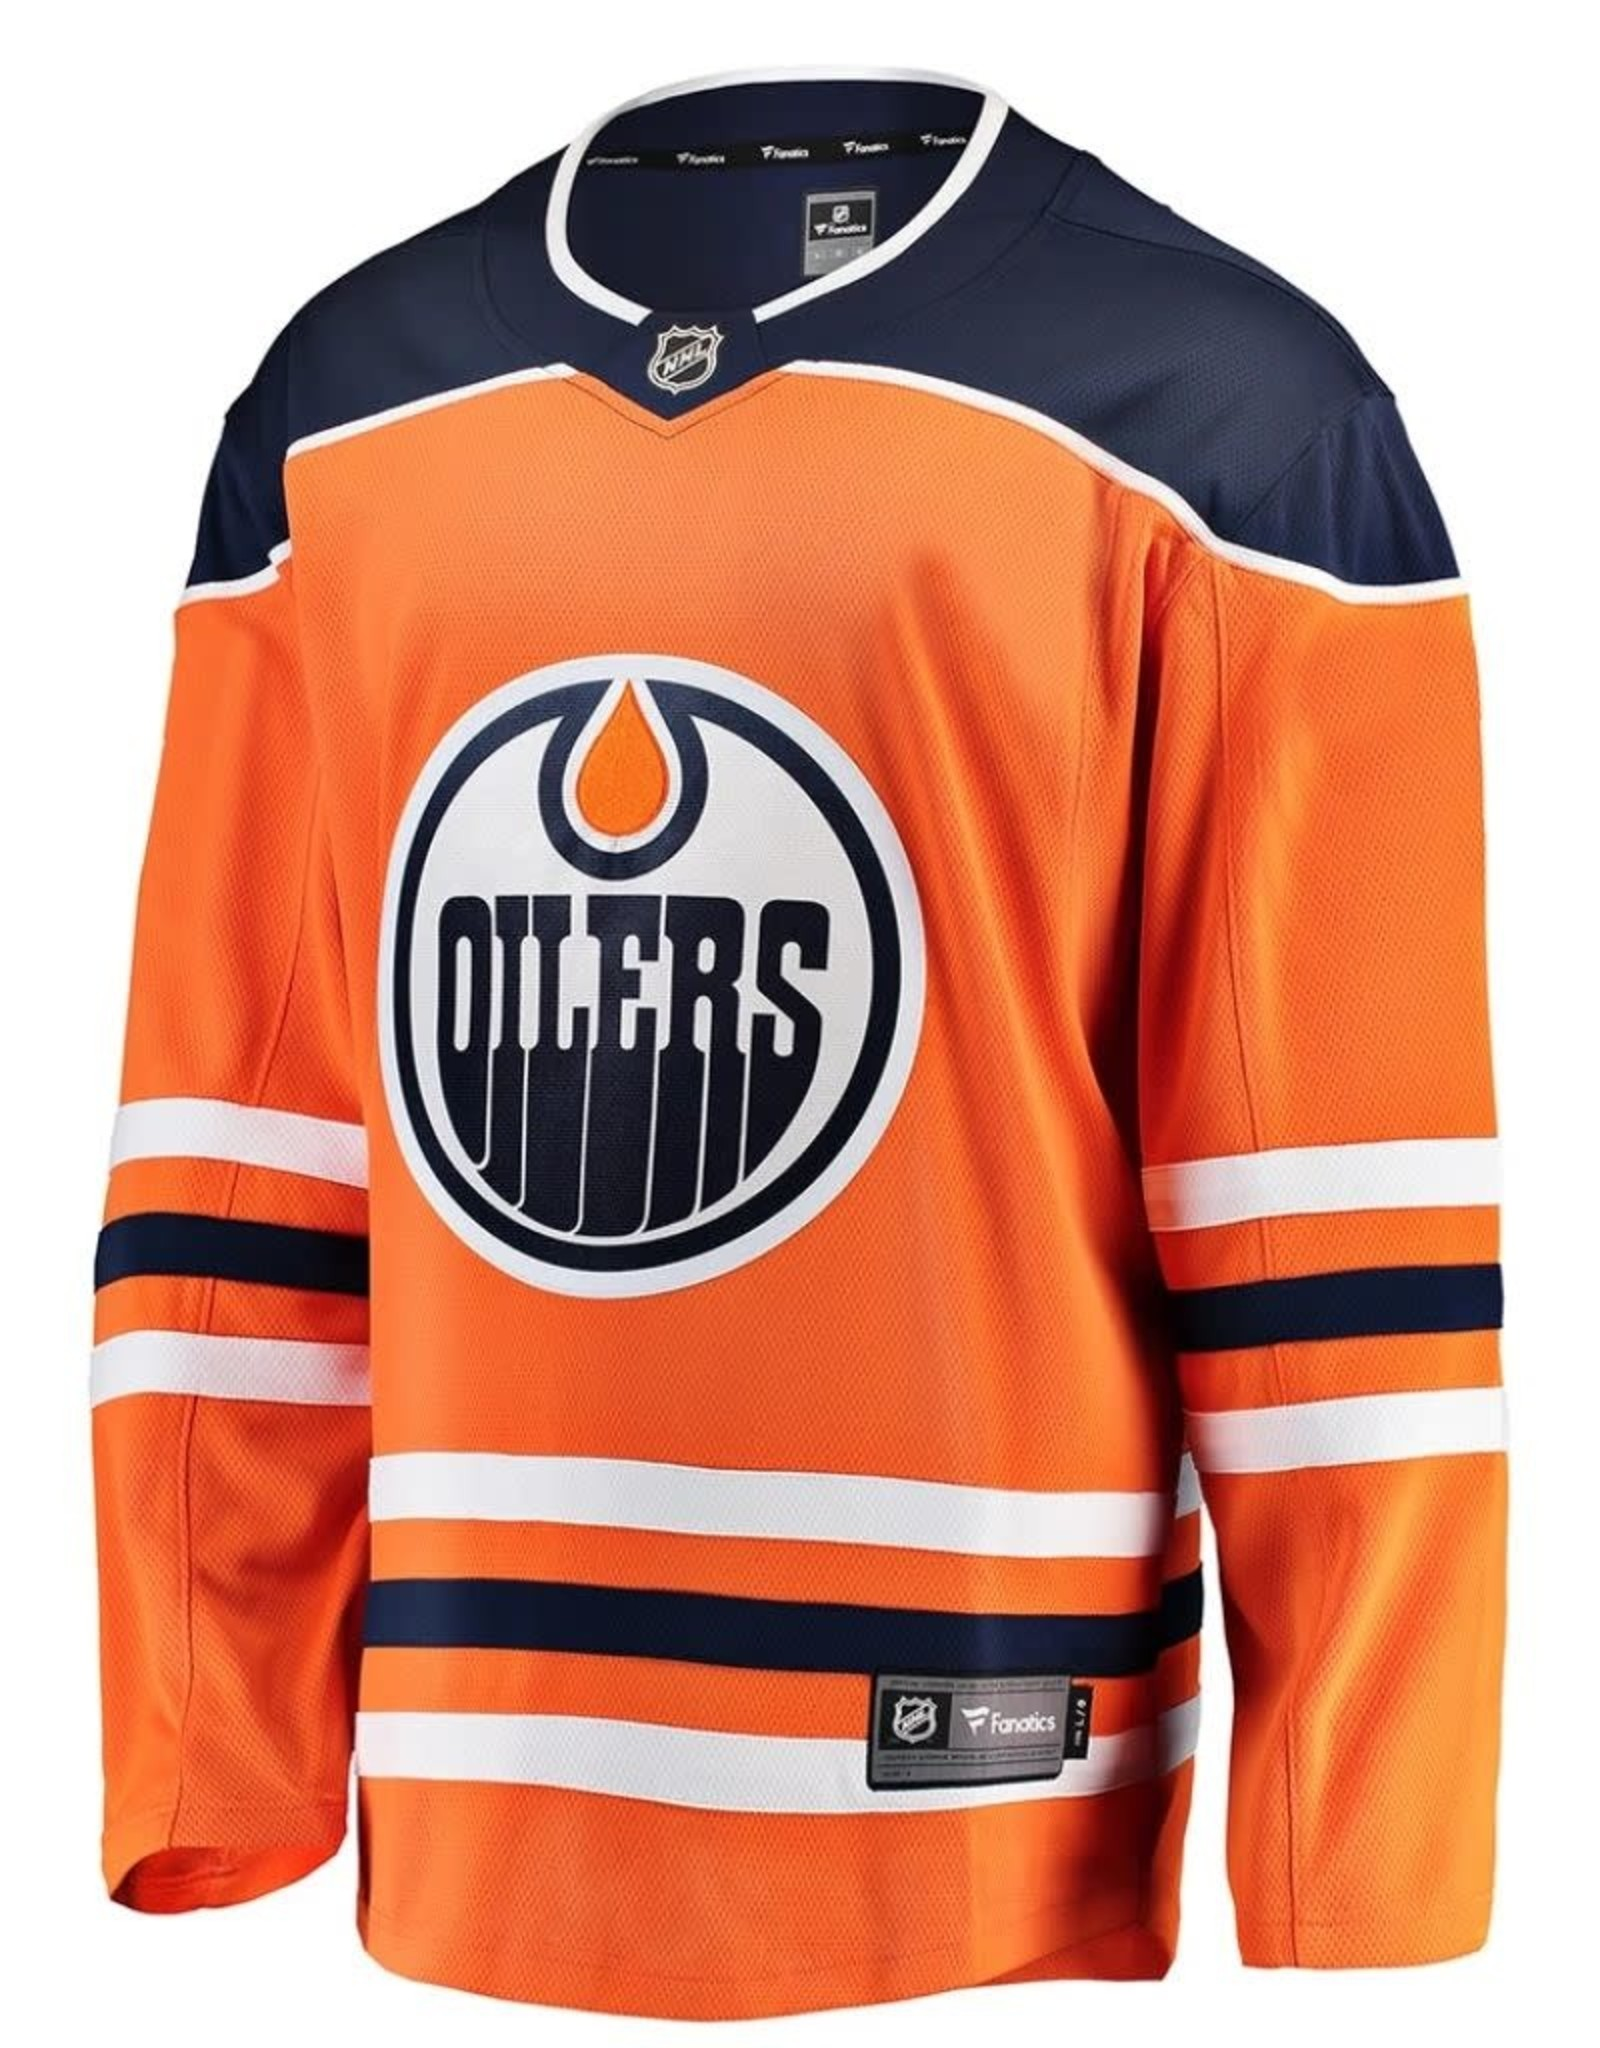 Fanatics Fanatics Men's Edmonton Oilers Orange Jersey